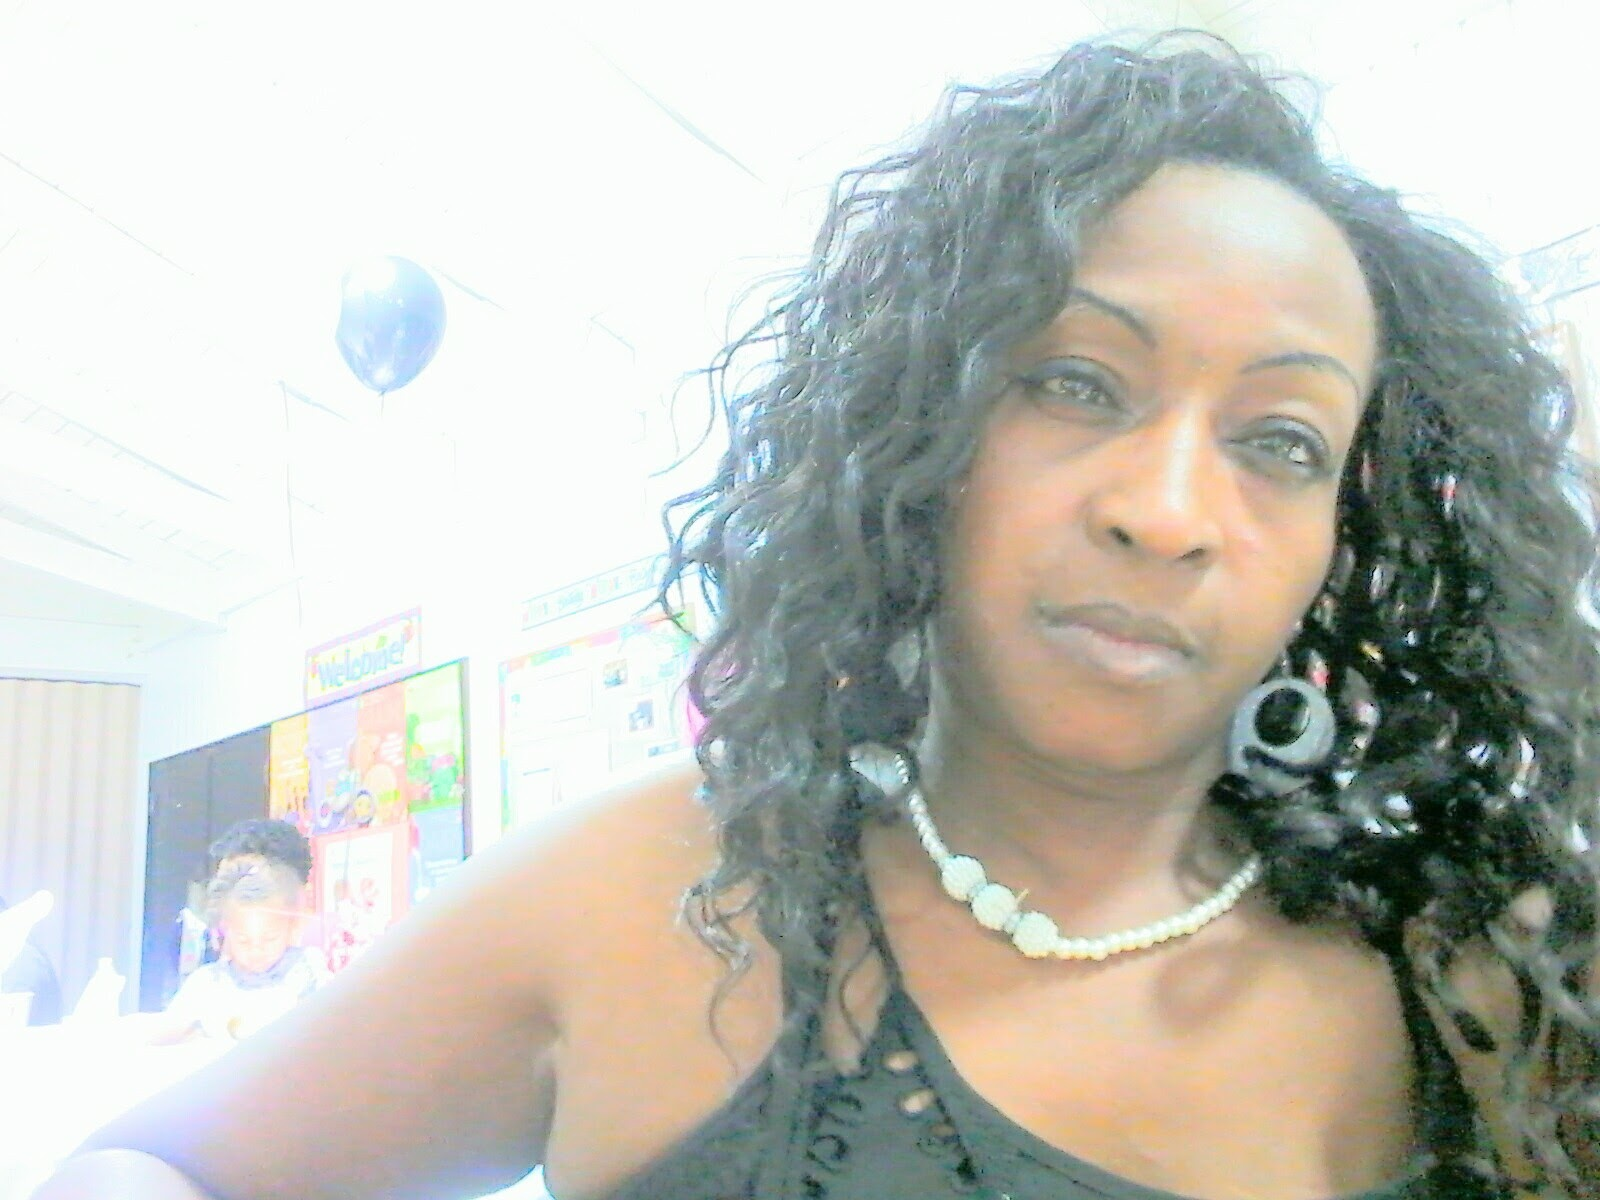 49-year-old, Single From: Atlanta, GA, United States